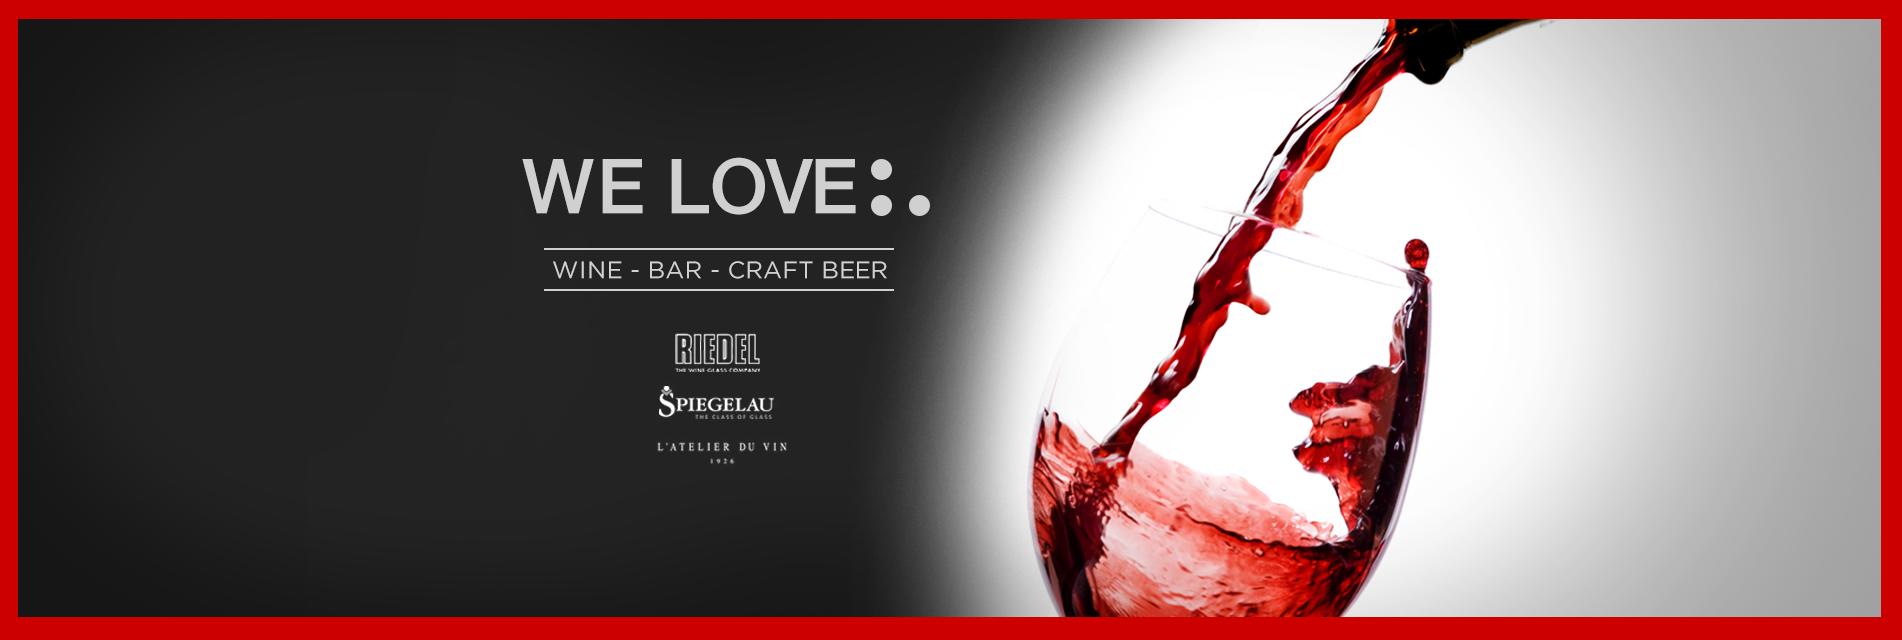 We love wine 2015